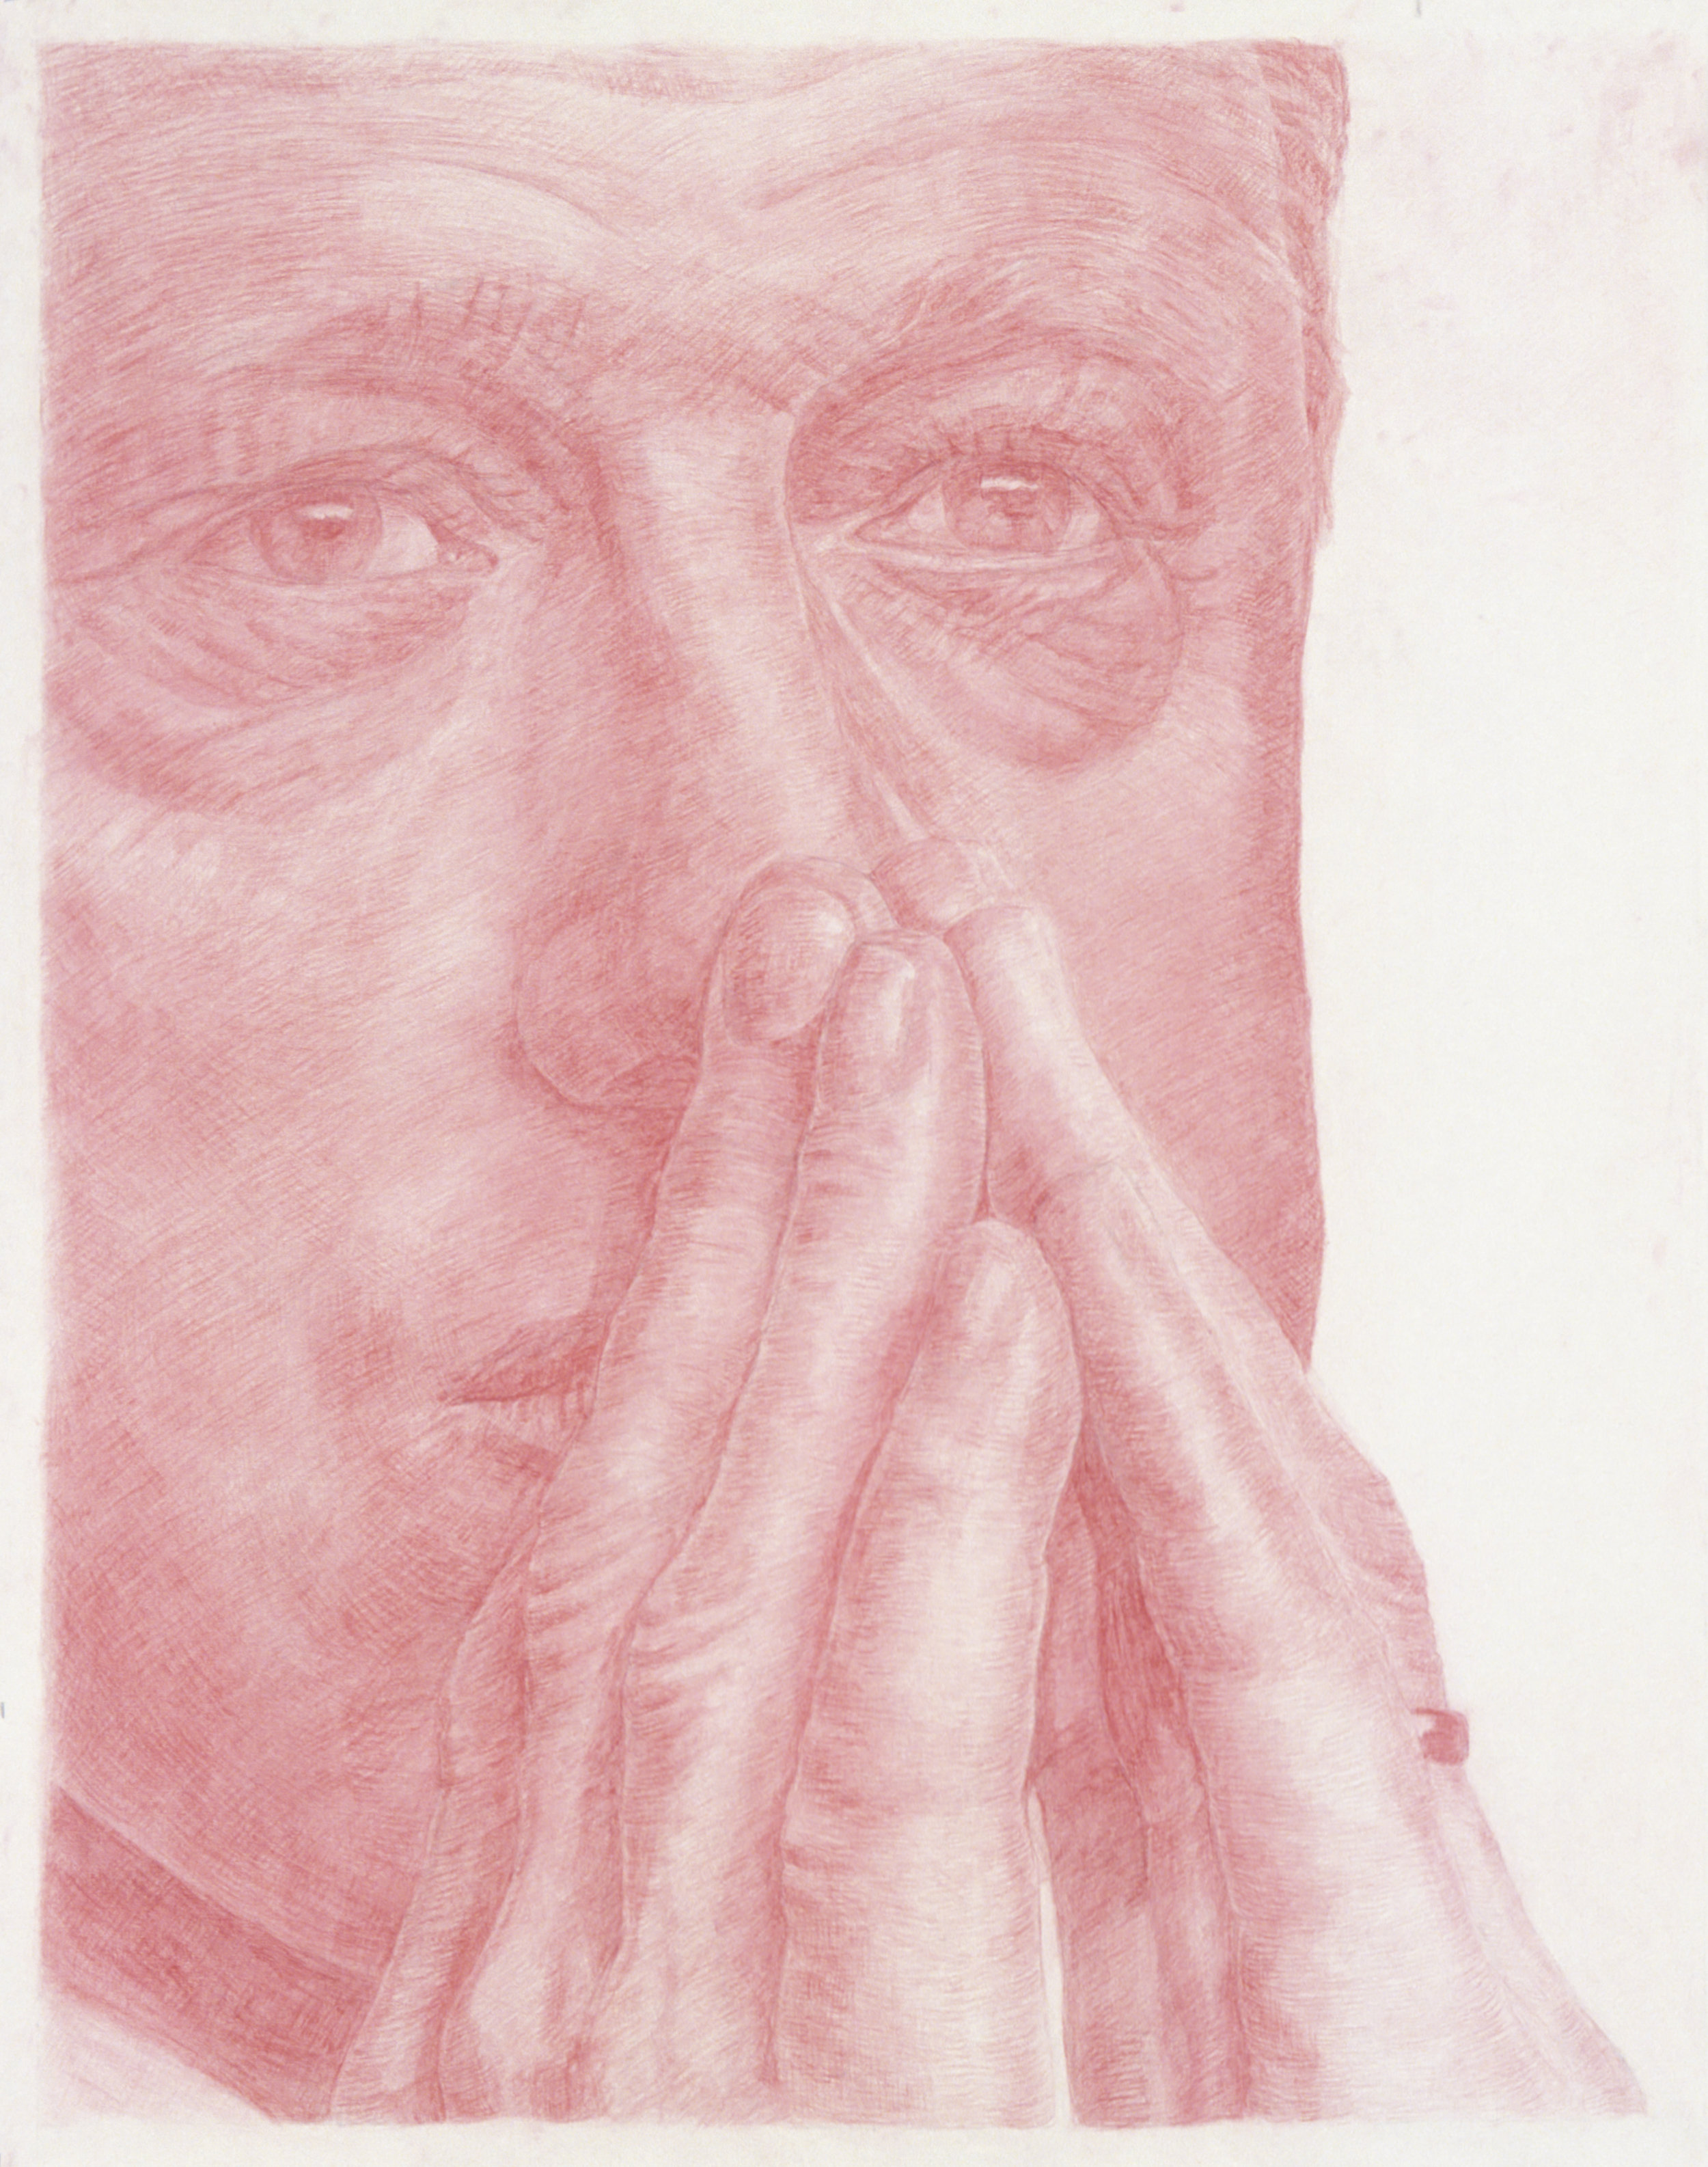 Praying Hands #3